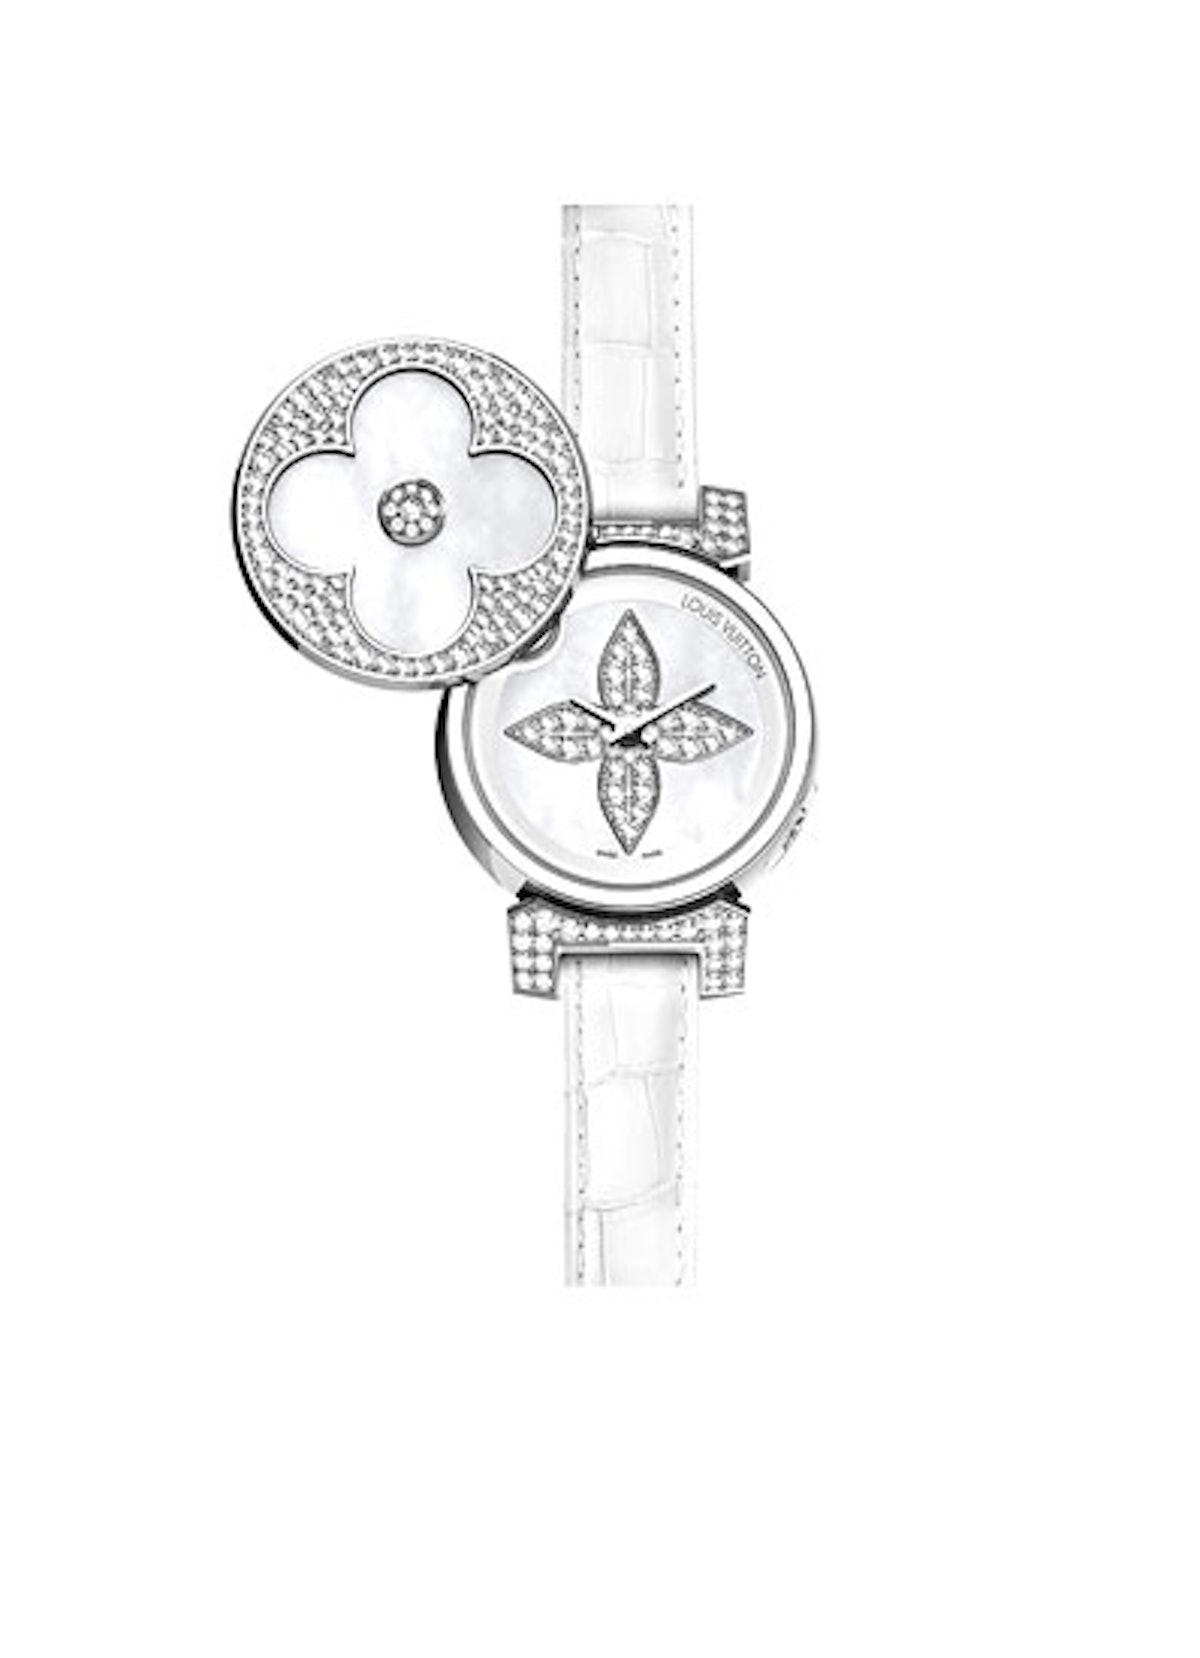 acss-basel-watches-roundup-03-v.jpg